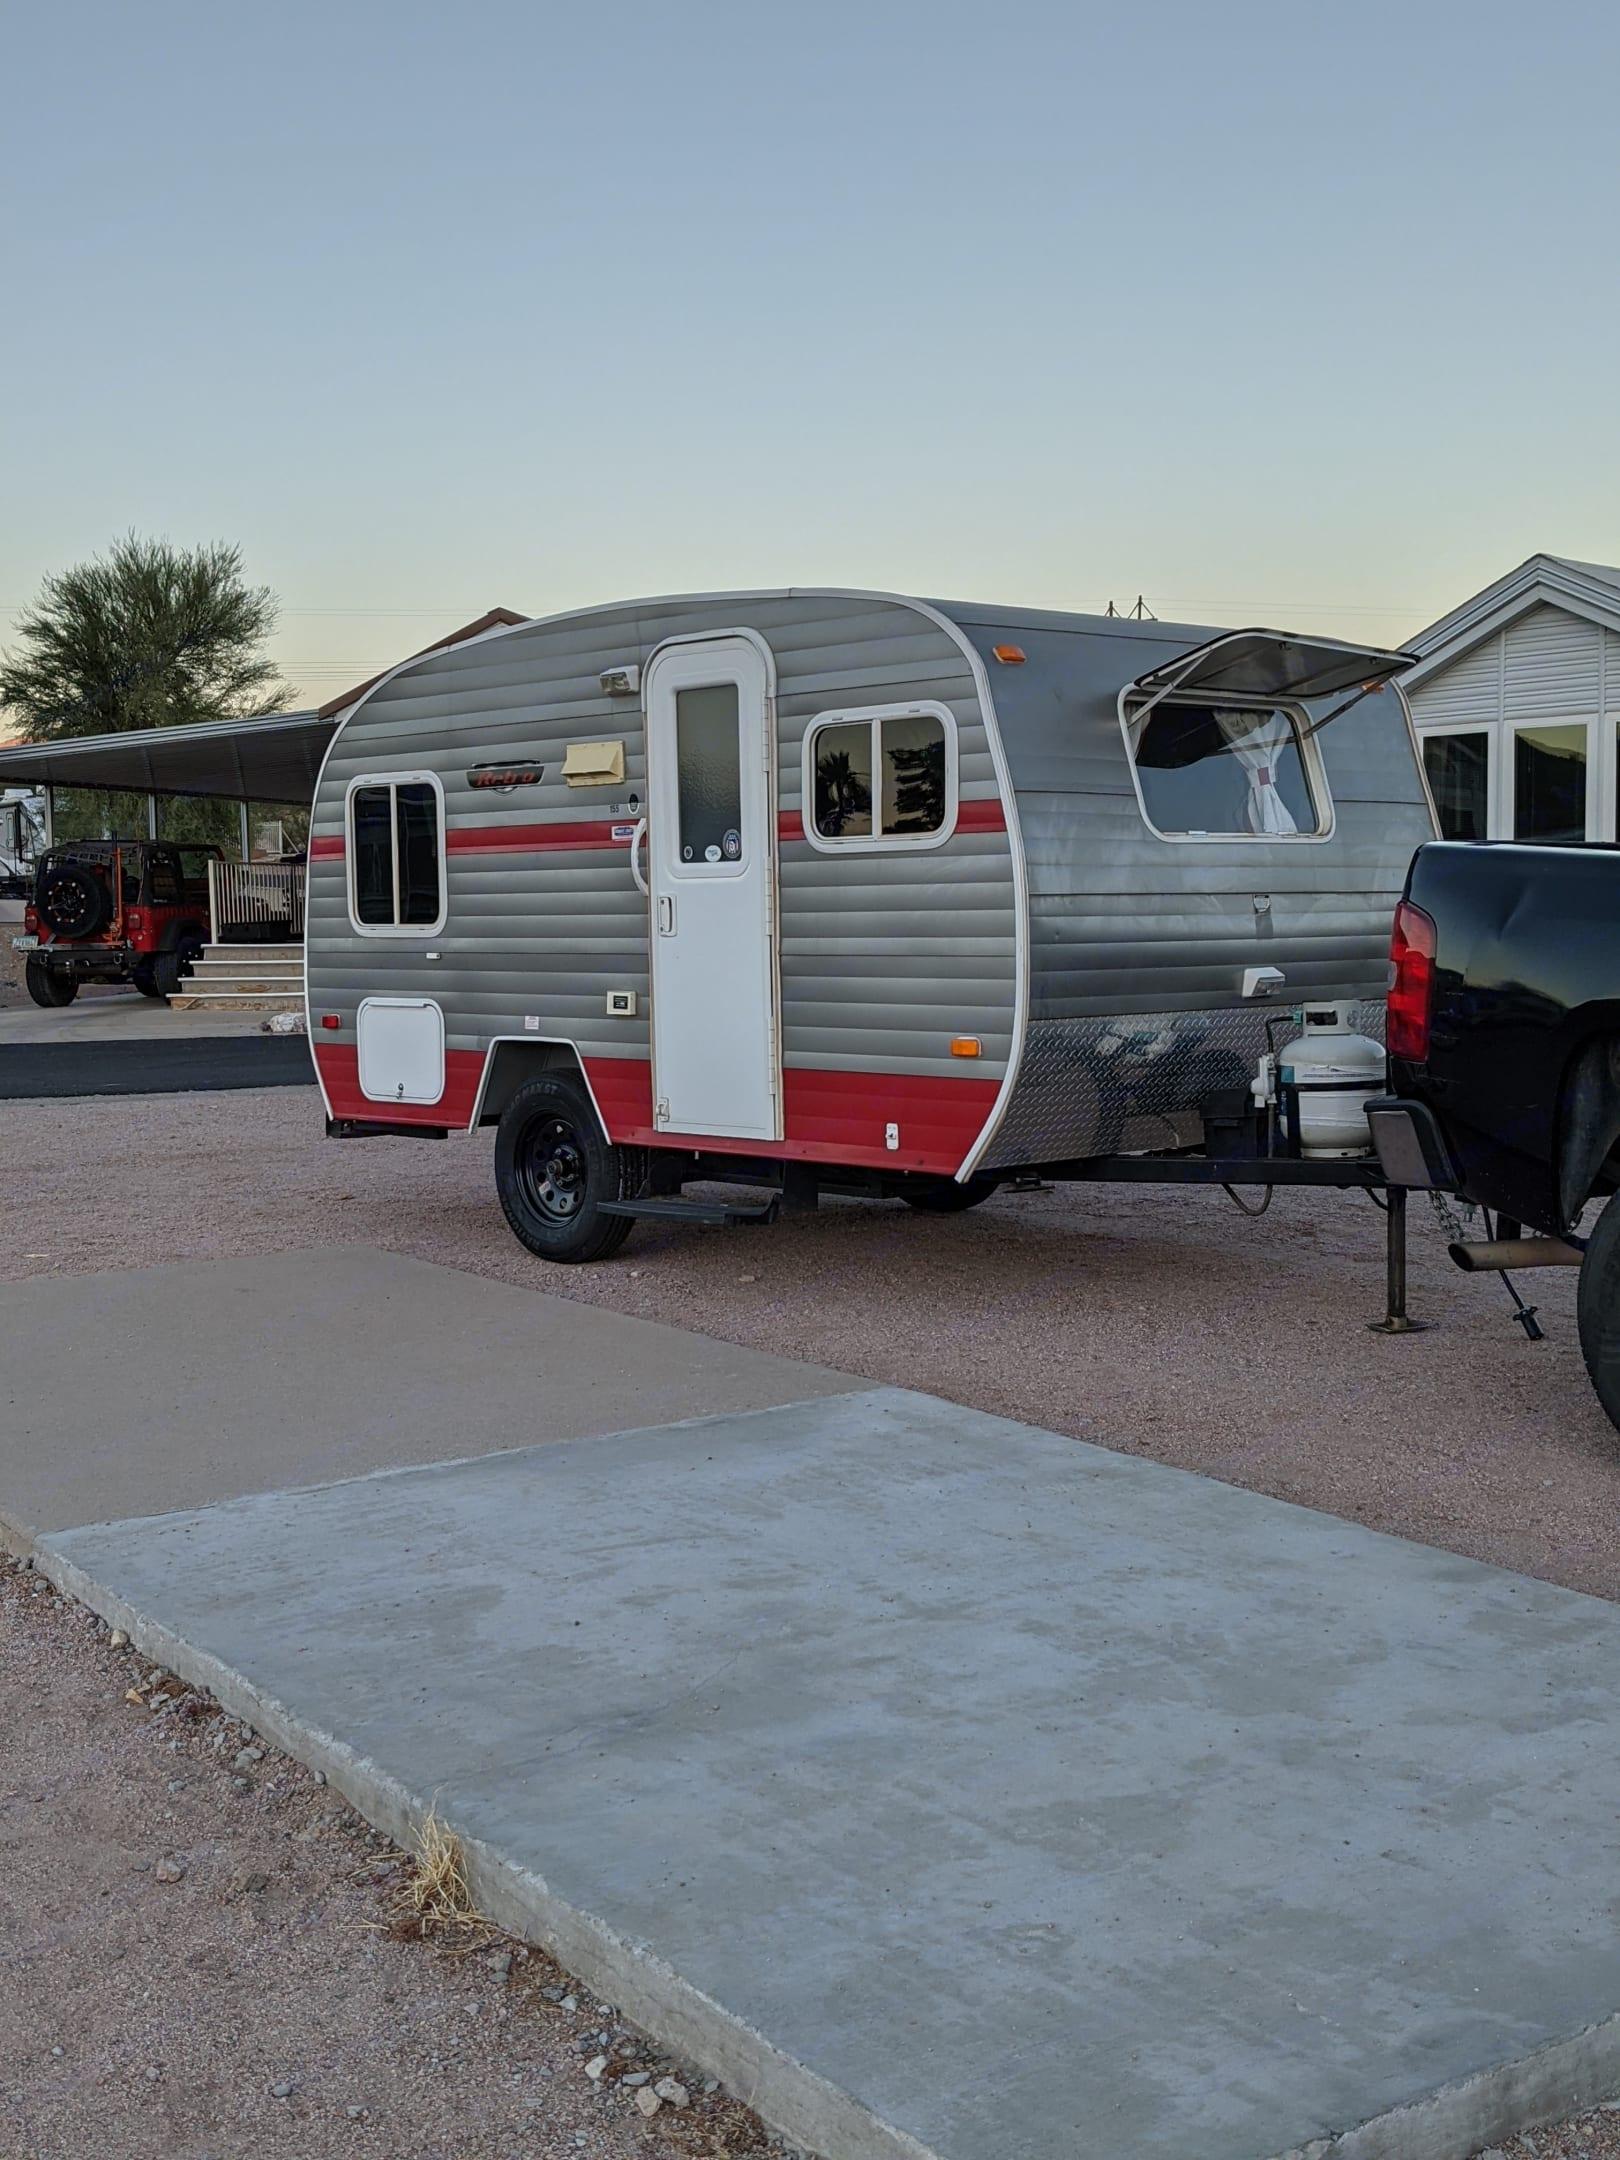 Retro style in a modern trailer. Riverside Rv Whitewater Retro 2014